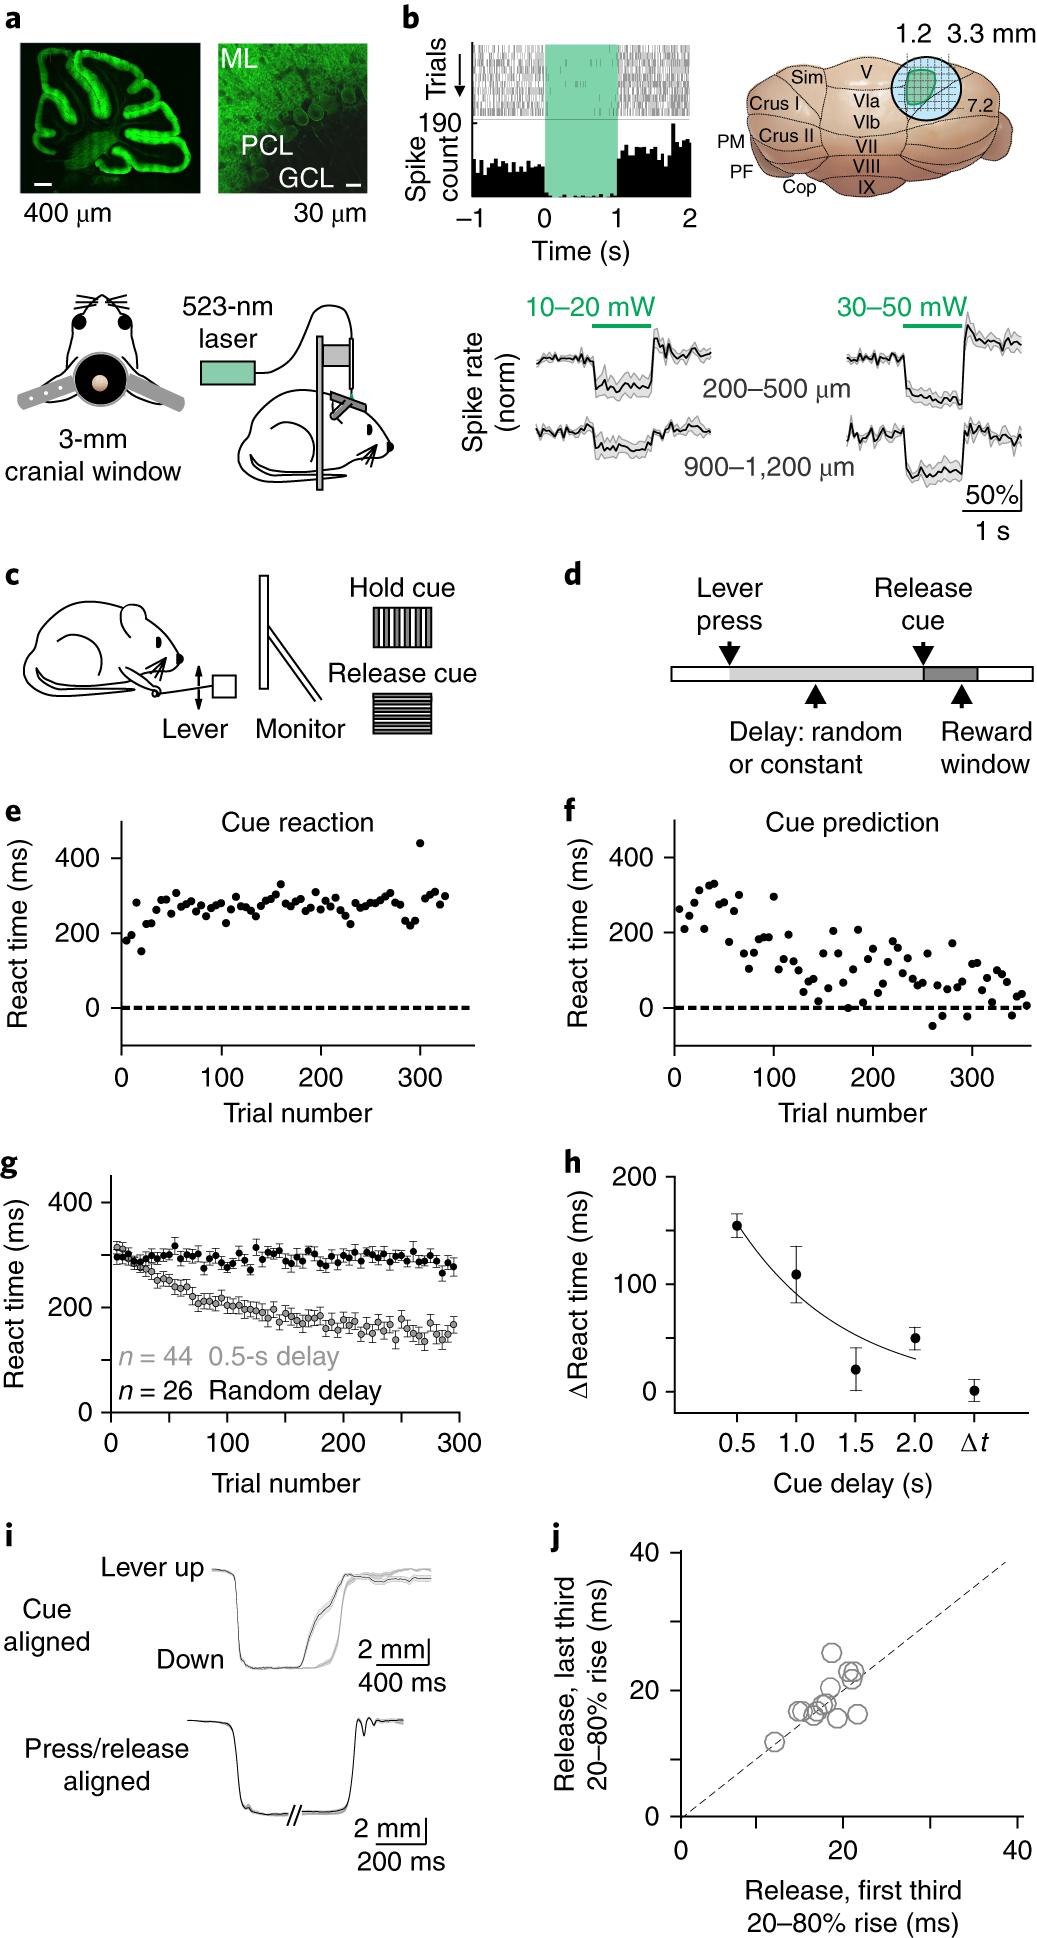 Coordinated Cerebellar Climbing Fiber Activity Signals Learned Figure 2 Basic Structure Of The Neuronal Circuitry In Cerebellum Sensorimotor Predictions Nature Neuroscience